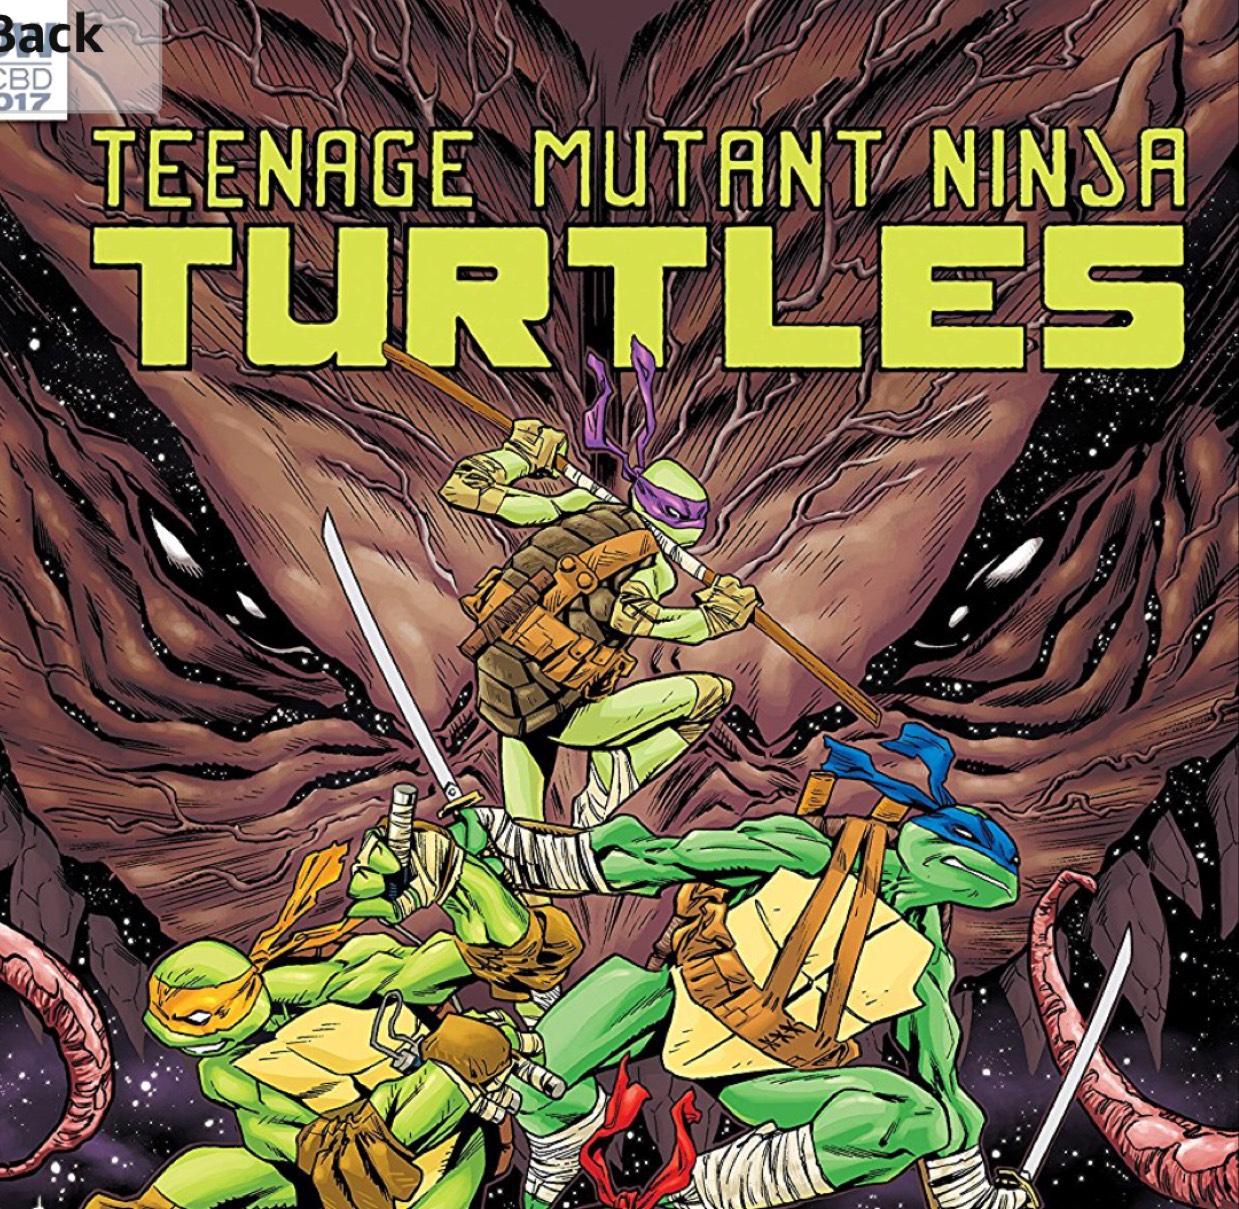 FREE DOWNLOAD - Teenage Mutant Ninja Turtles comic book - Amazon